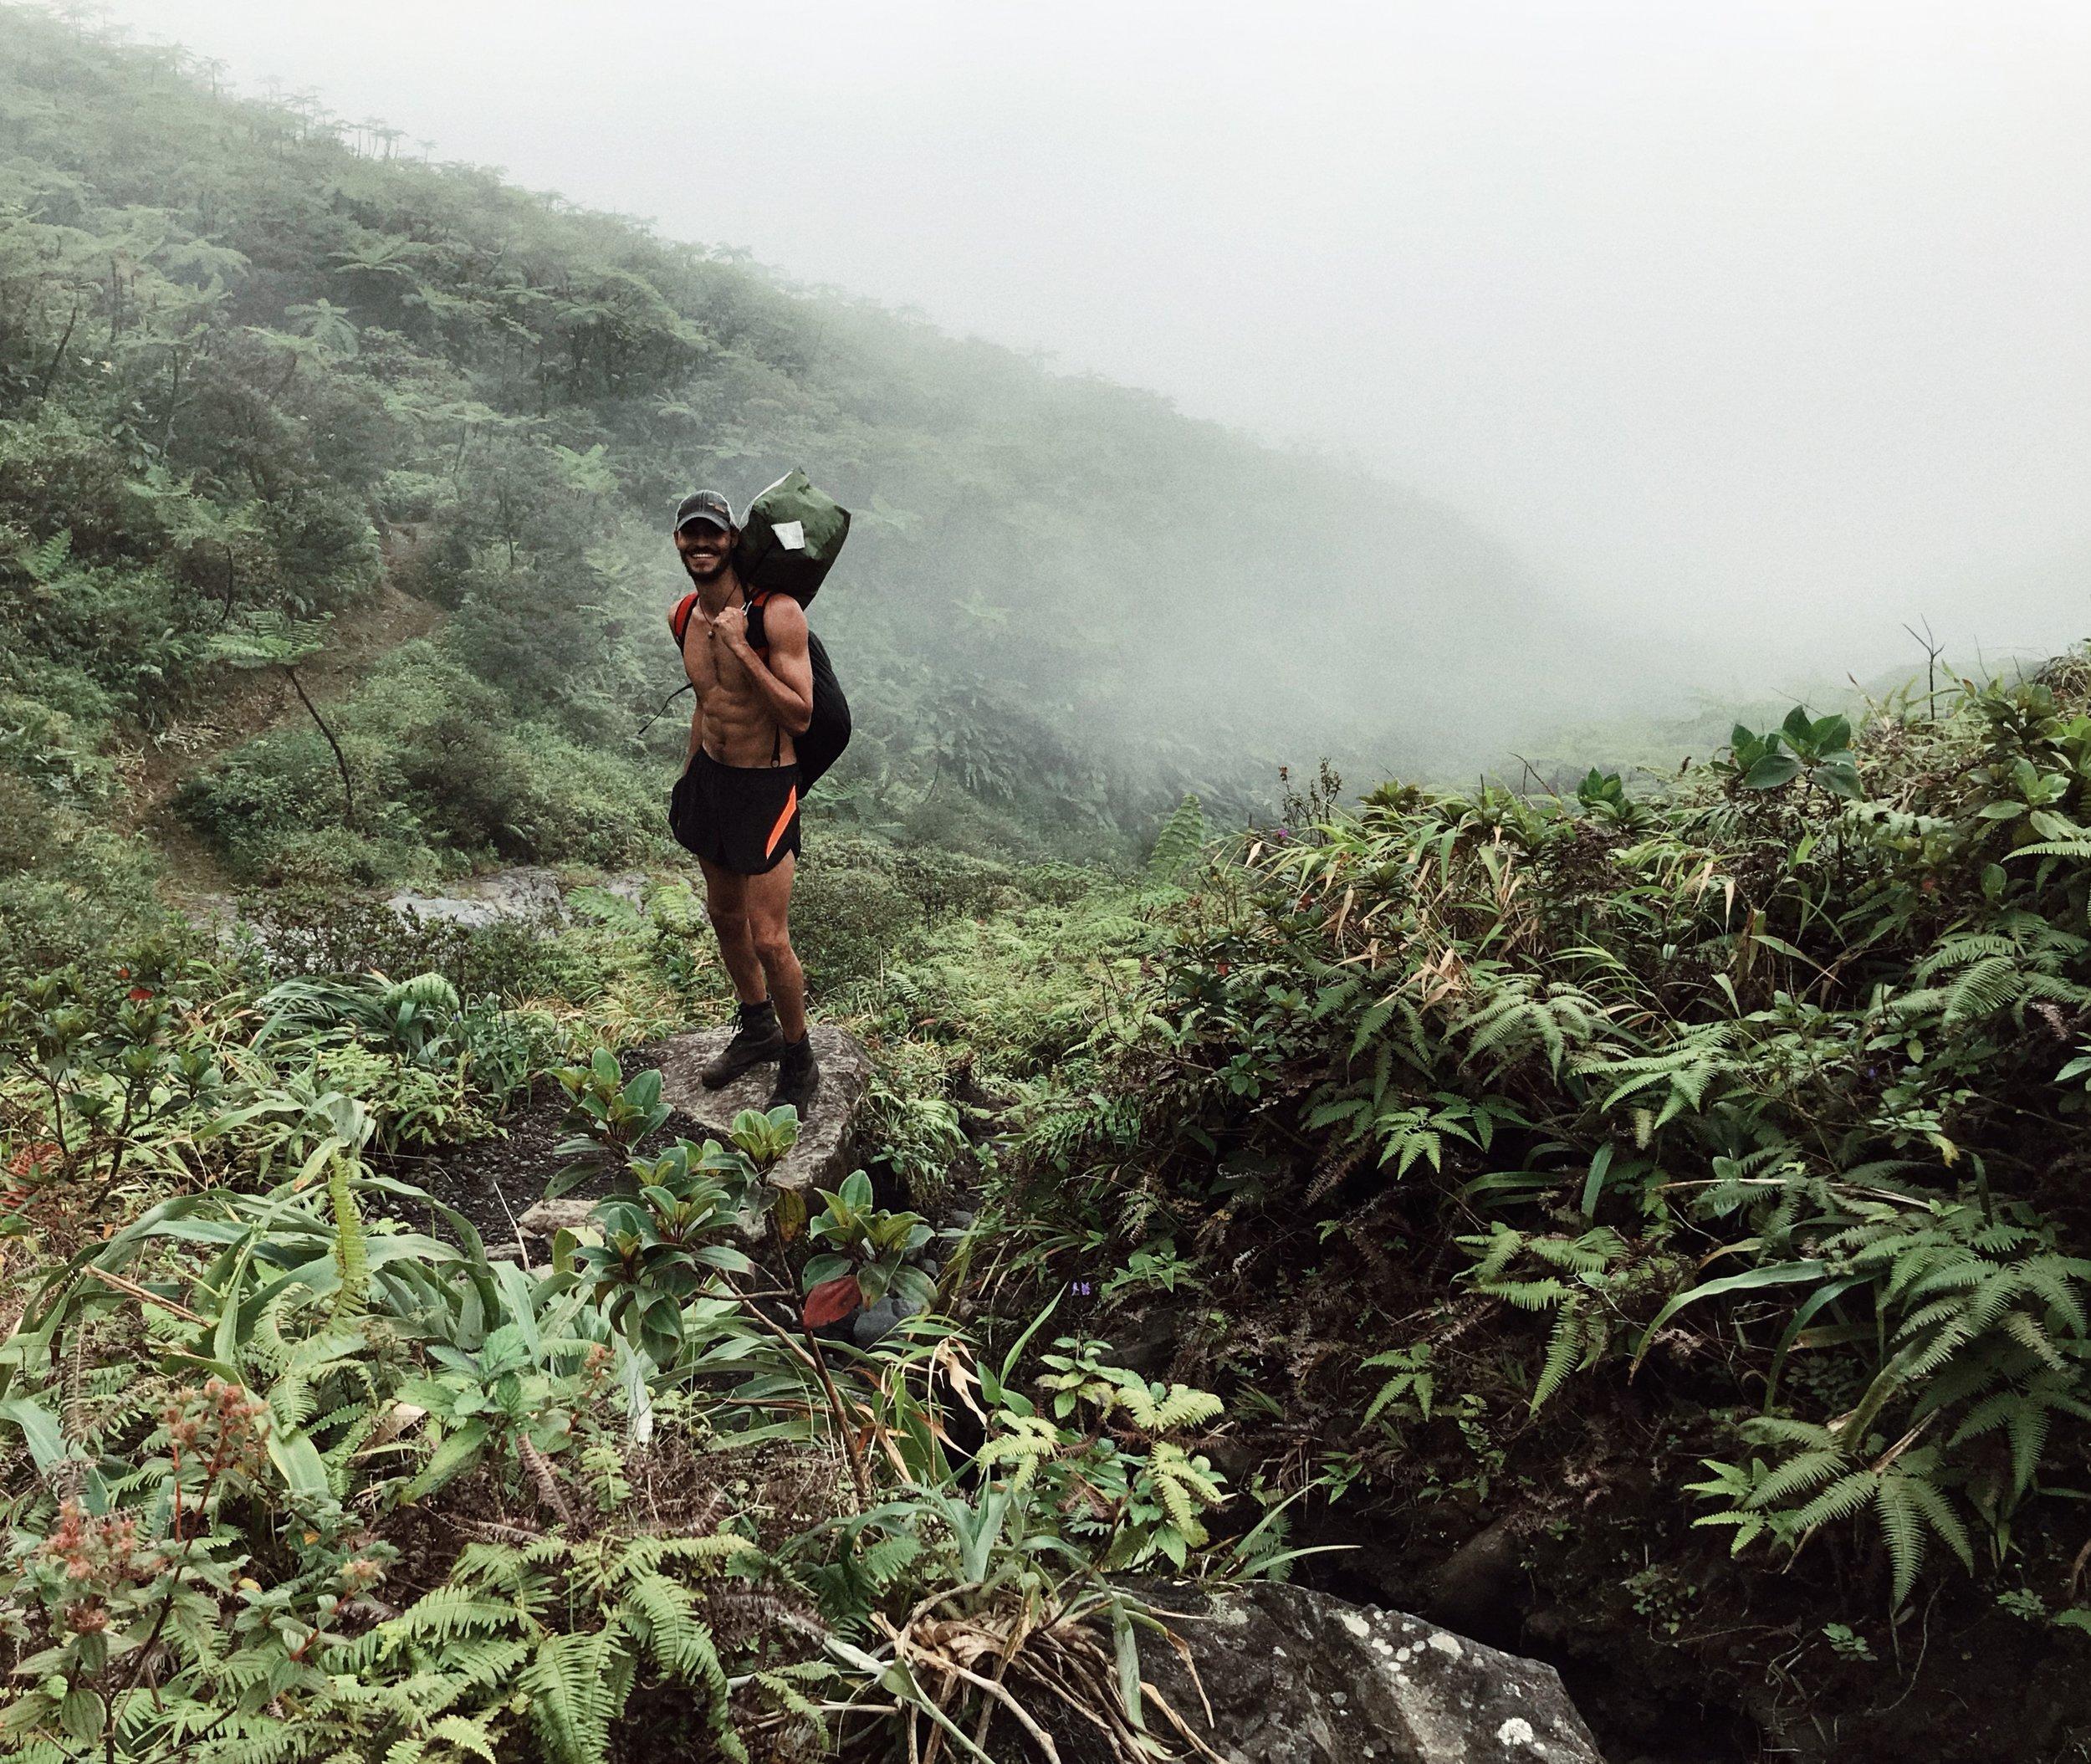 09:54 - Muscling Gear Down the Volcano. p.c.:Kai Best.